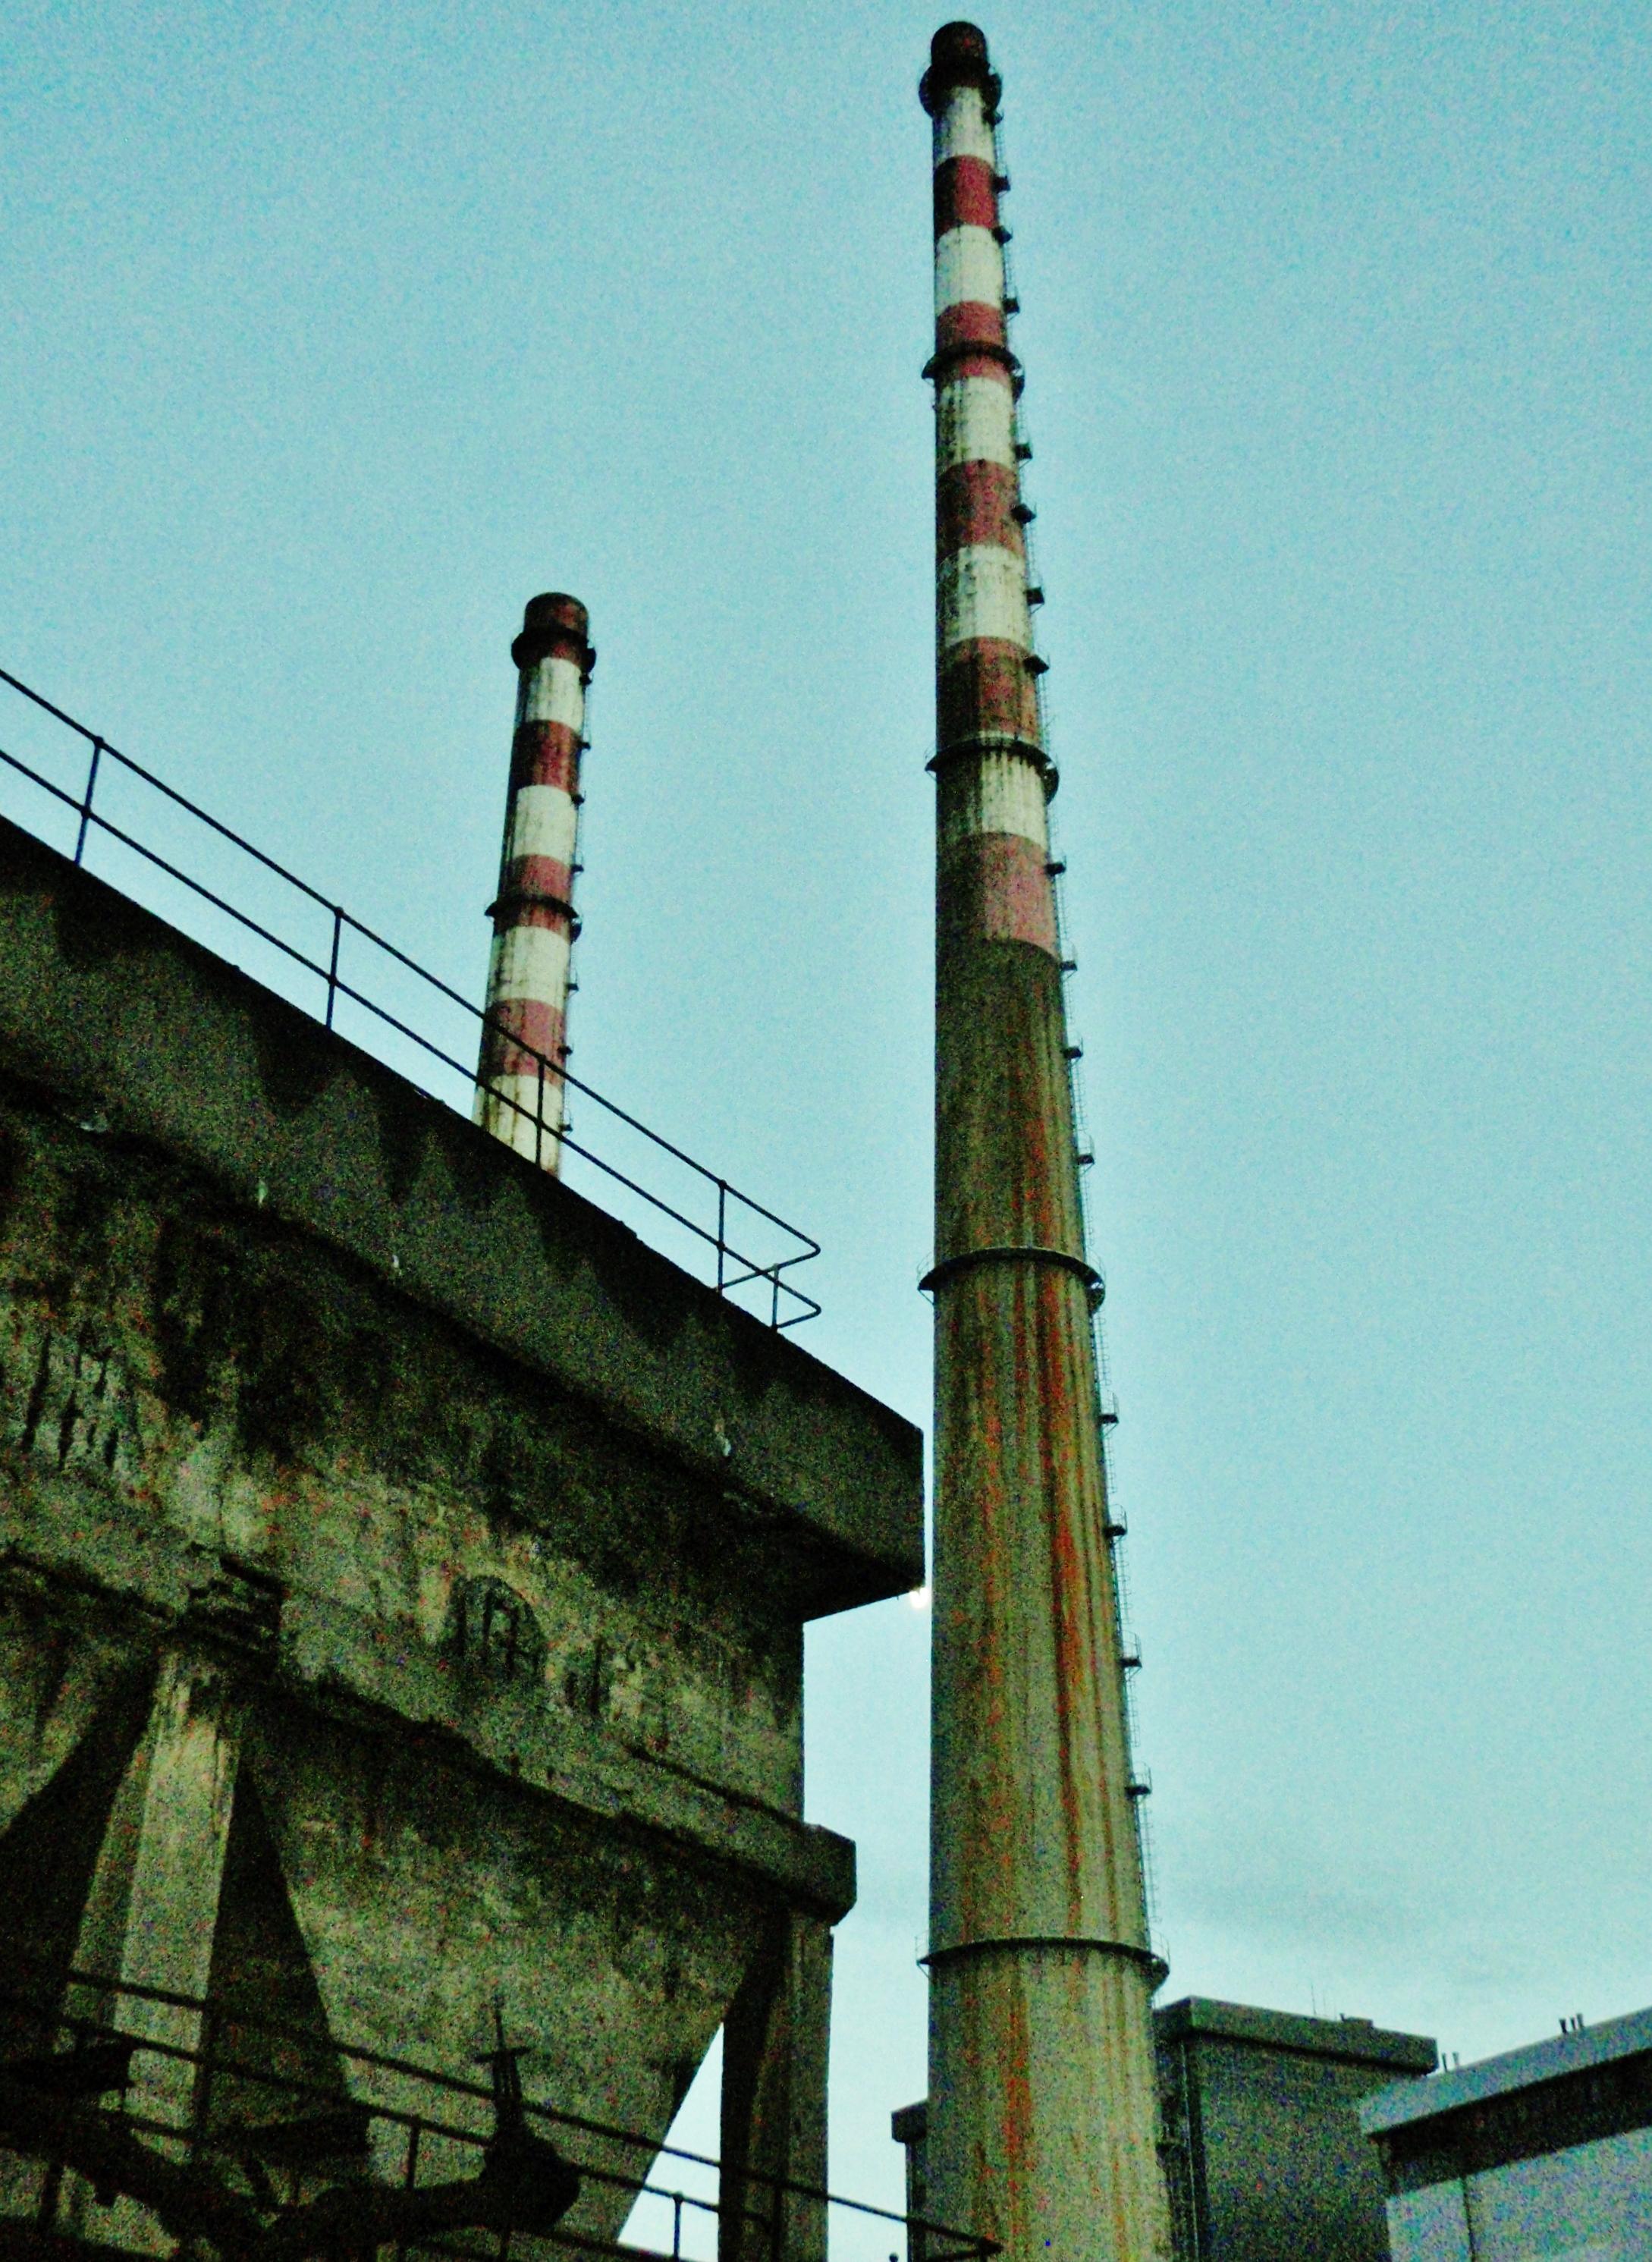 Abandoned Pigeon House PowerStation, Dublin (Ireland) - Derelict World Photography – Lainey Quinn